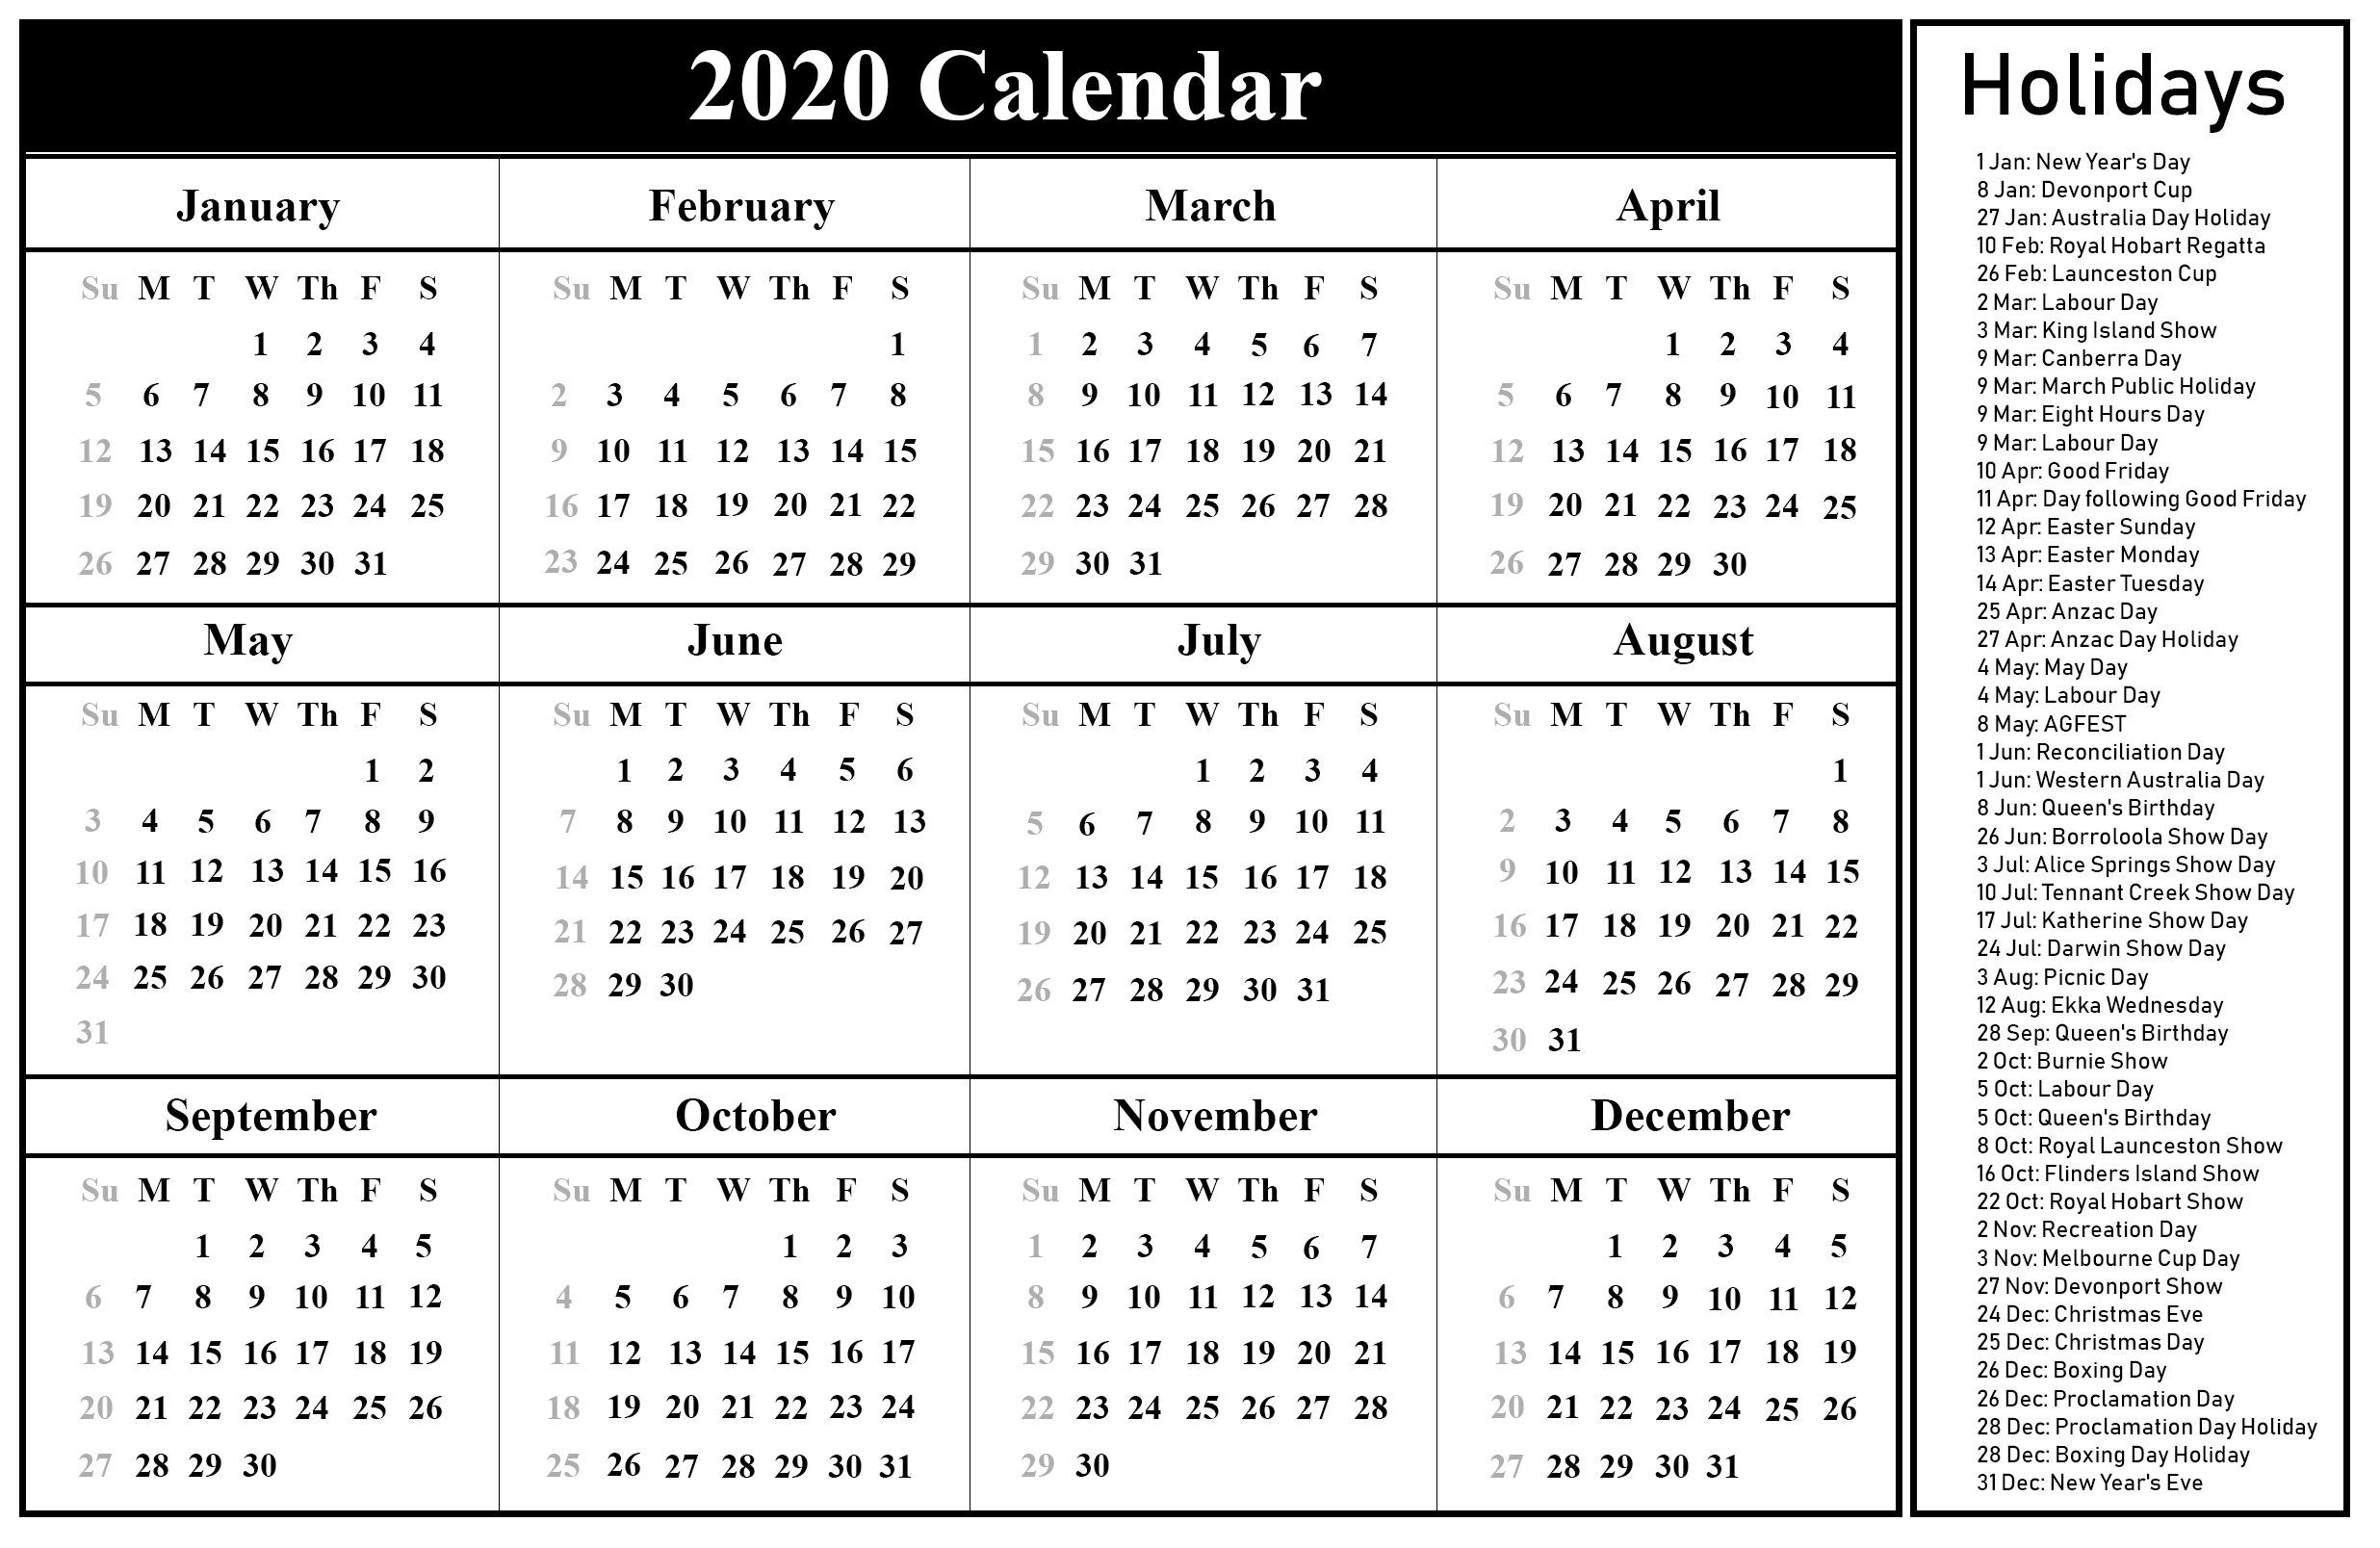 Free Blank Australia Calendar 2020 In Pdf, Excel & Word with regard to 2020 Calendar Australian